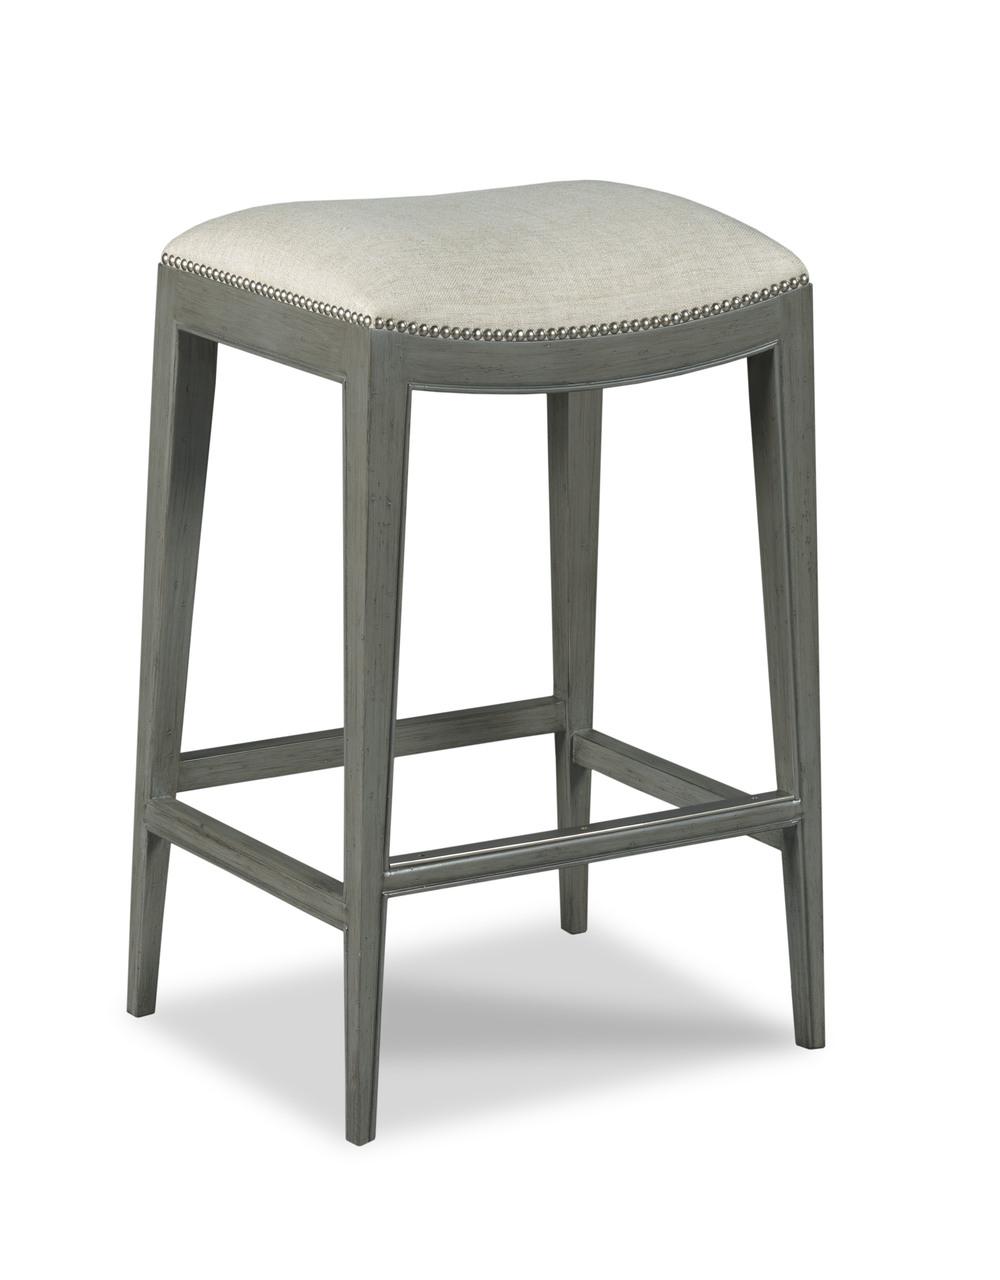 Woodbridge Furniture Company - Saddle Seat Counter Stool